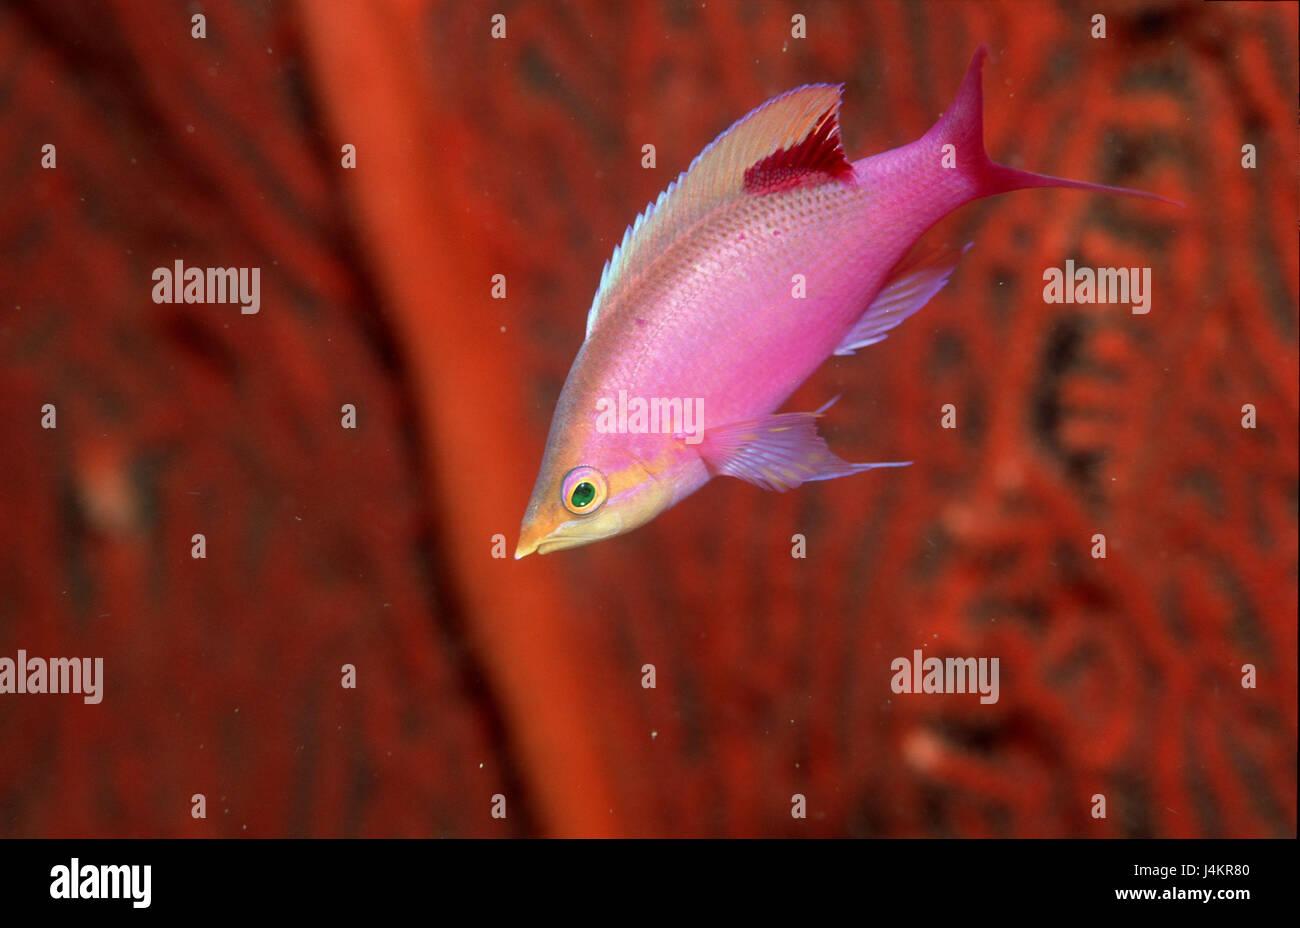 Tuka-flag perch, Pseudanthias tuka, coral, close up Stock Photo